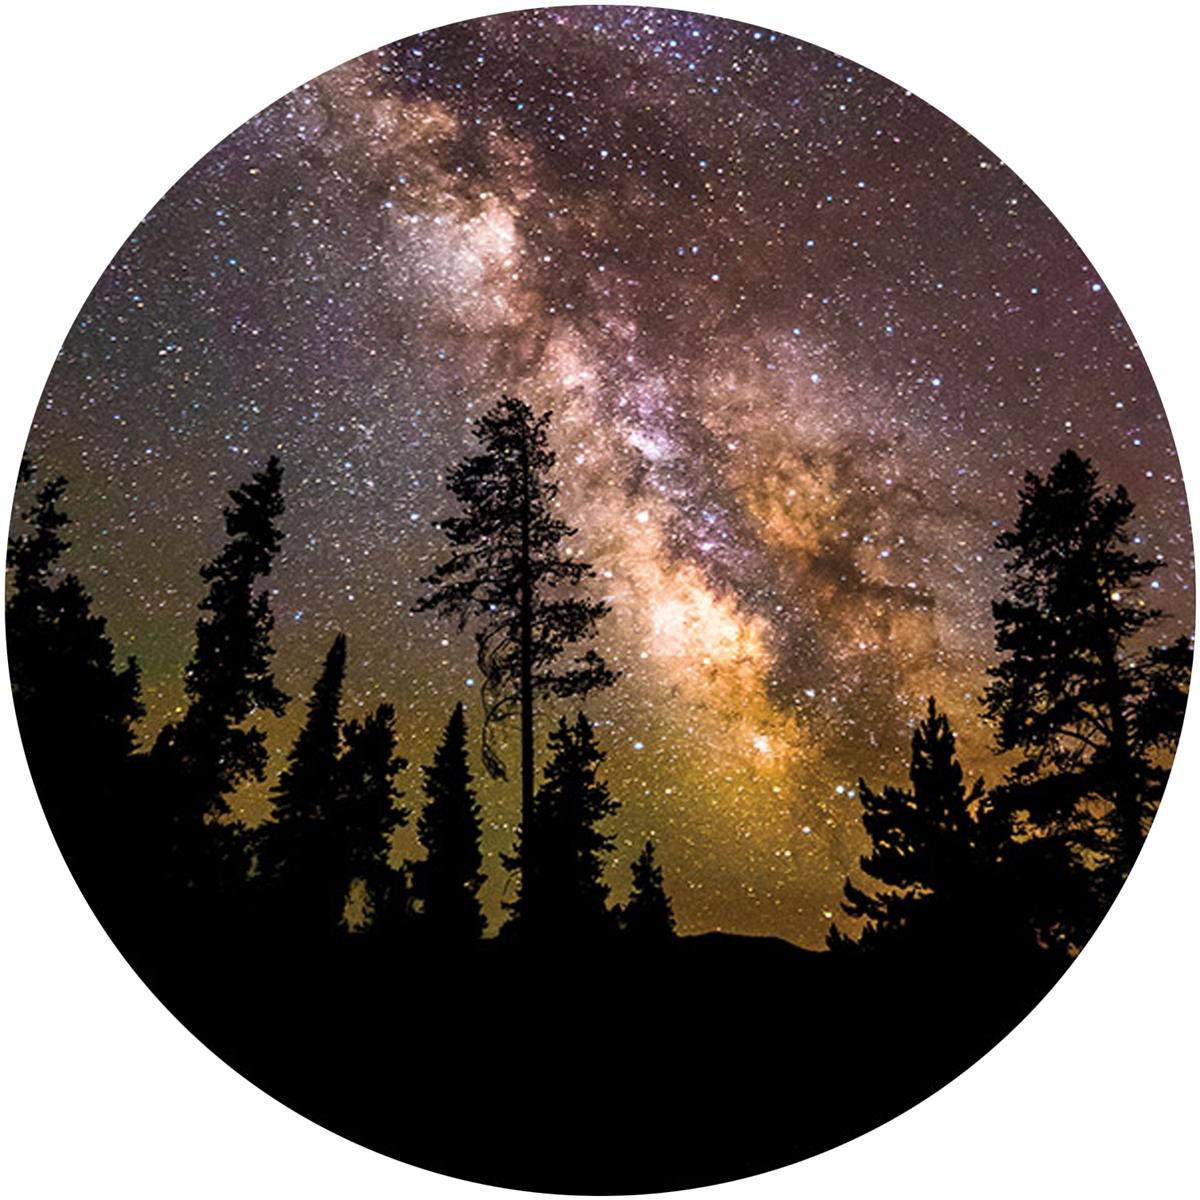 Milky Way Over Trees Envelope Seal